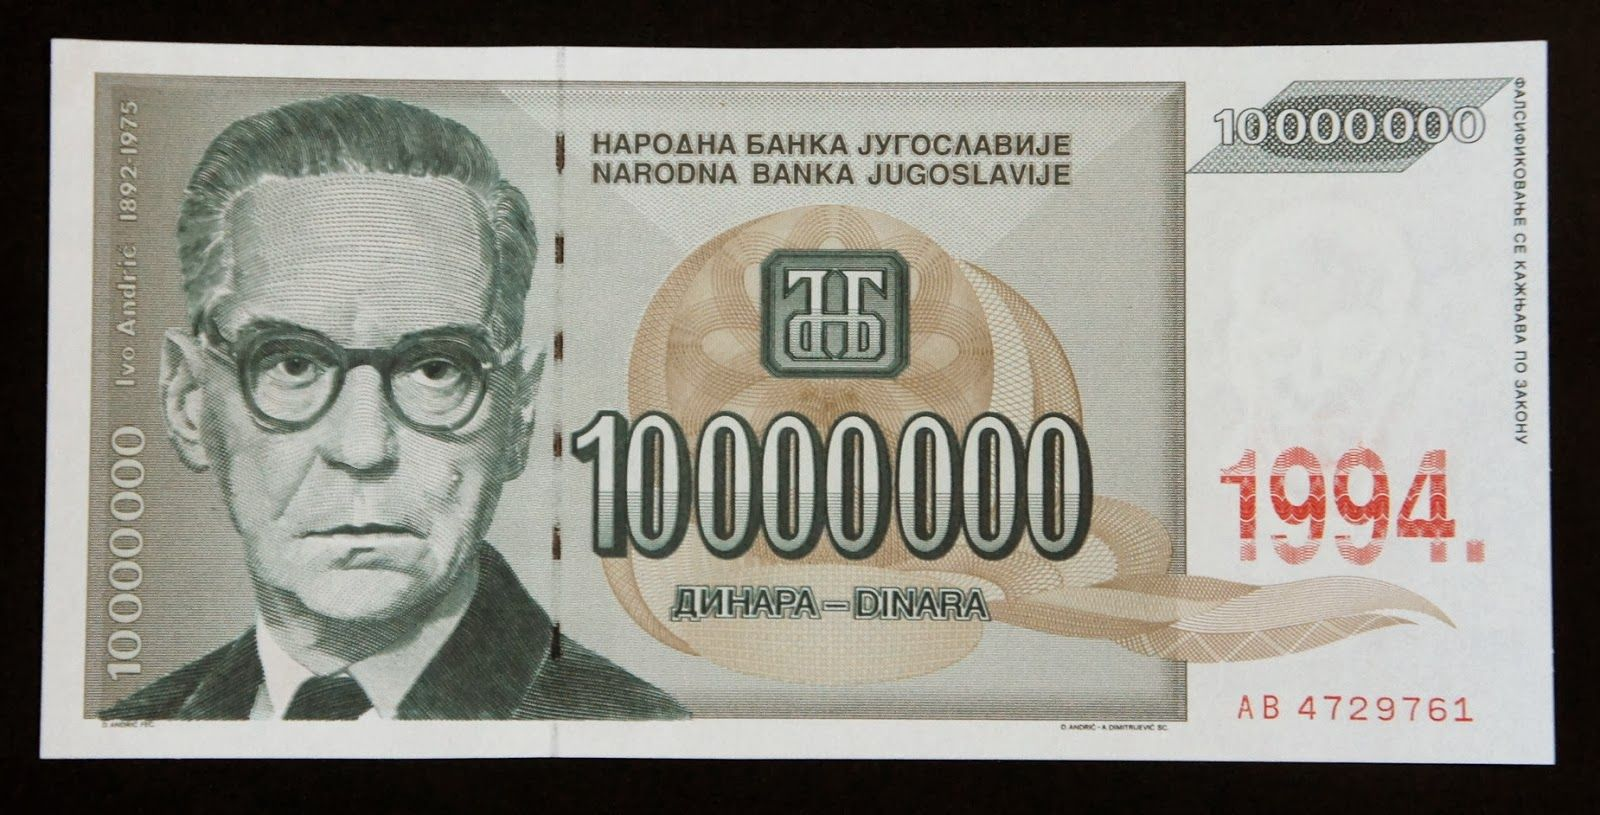 Marks Money Museum Rare Banknotes  Billion Dinara Hyperinflation Overprint Money